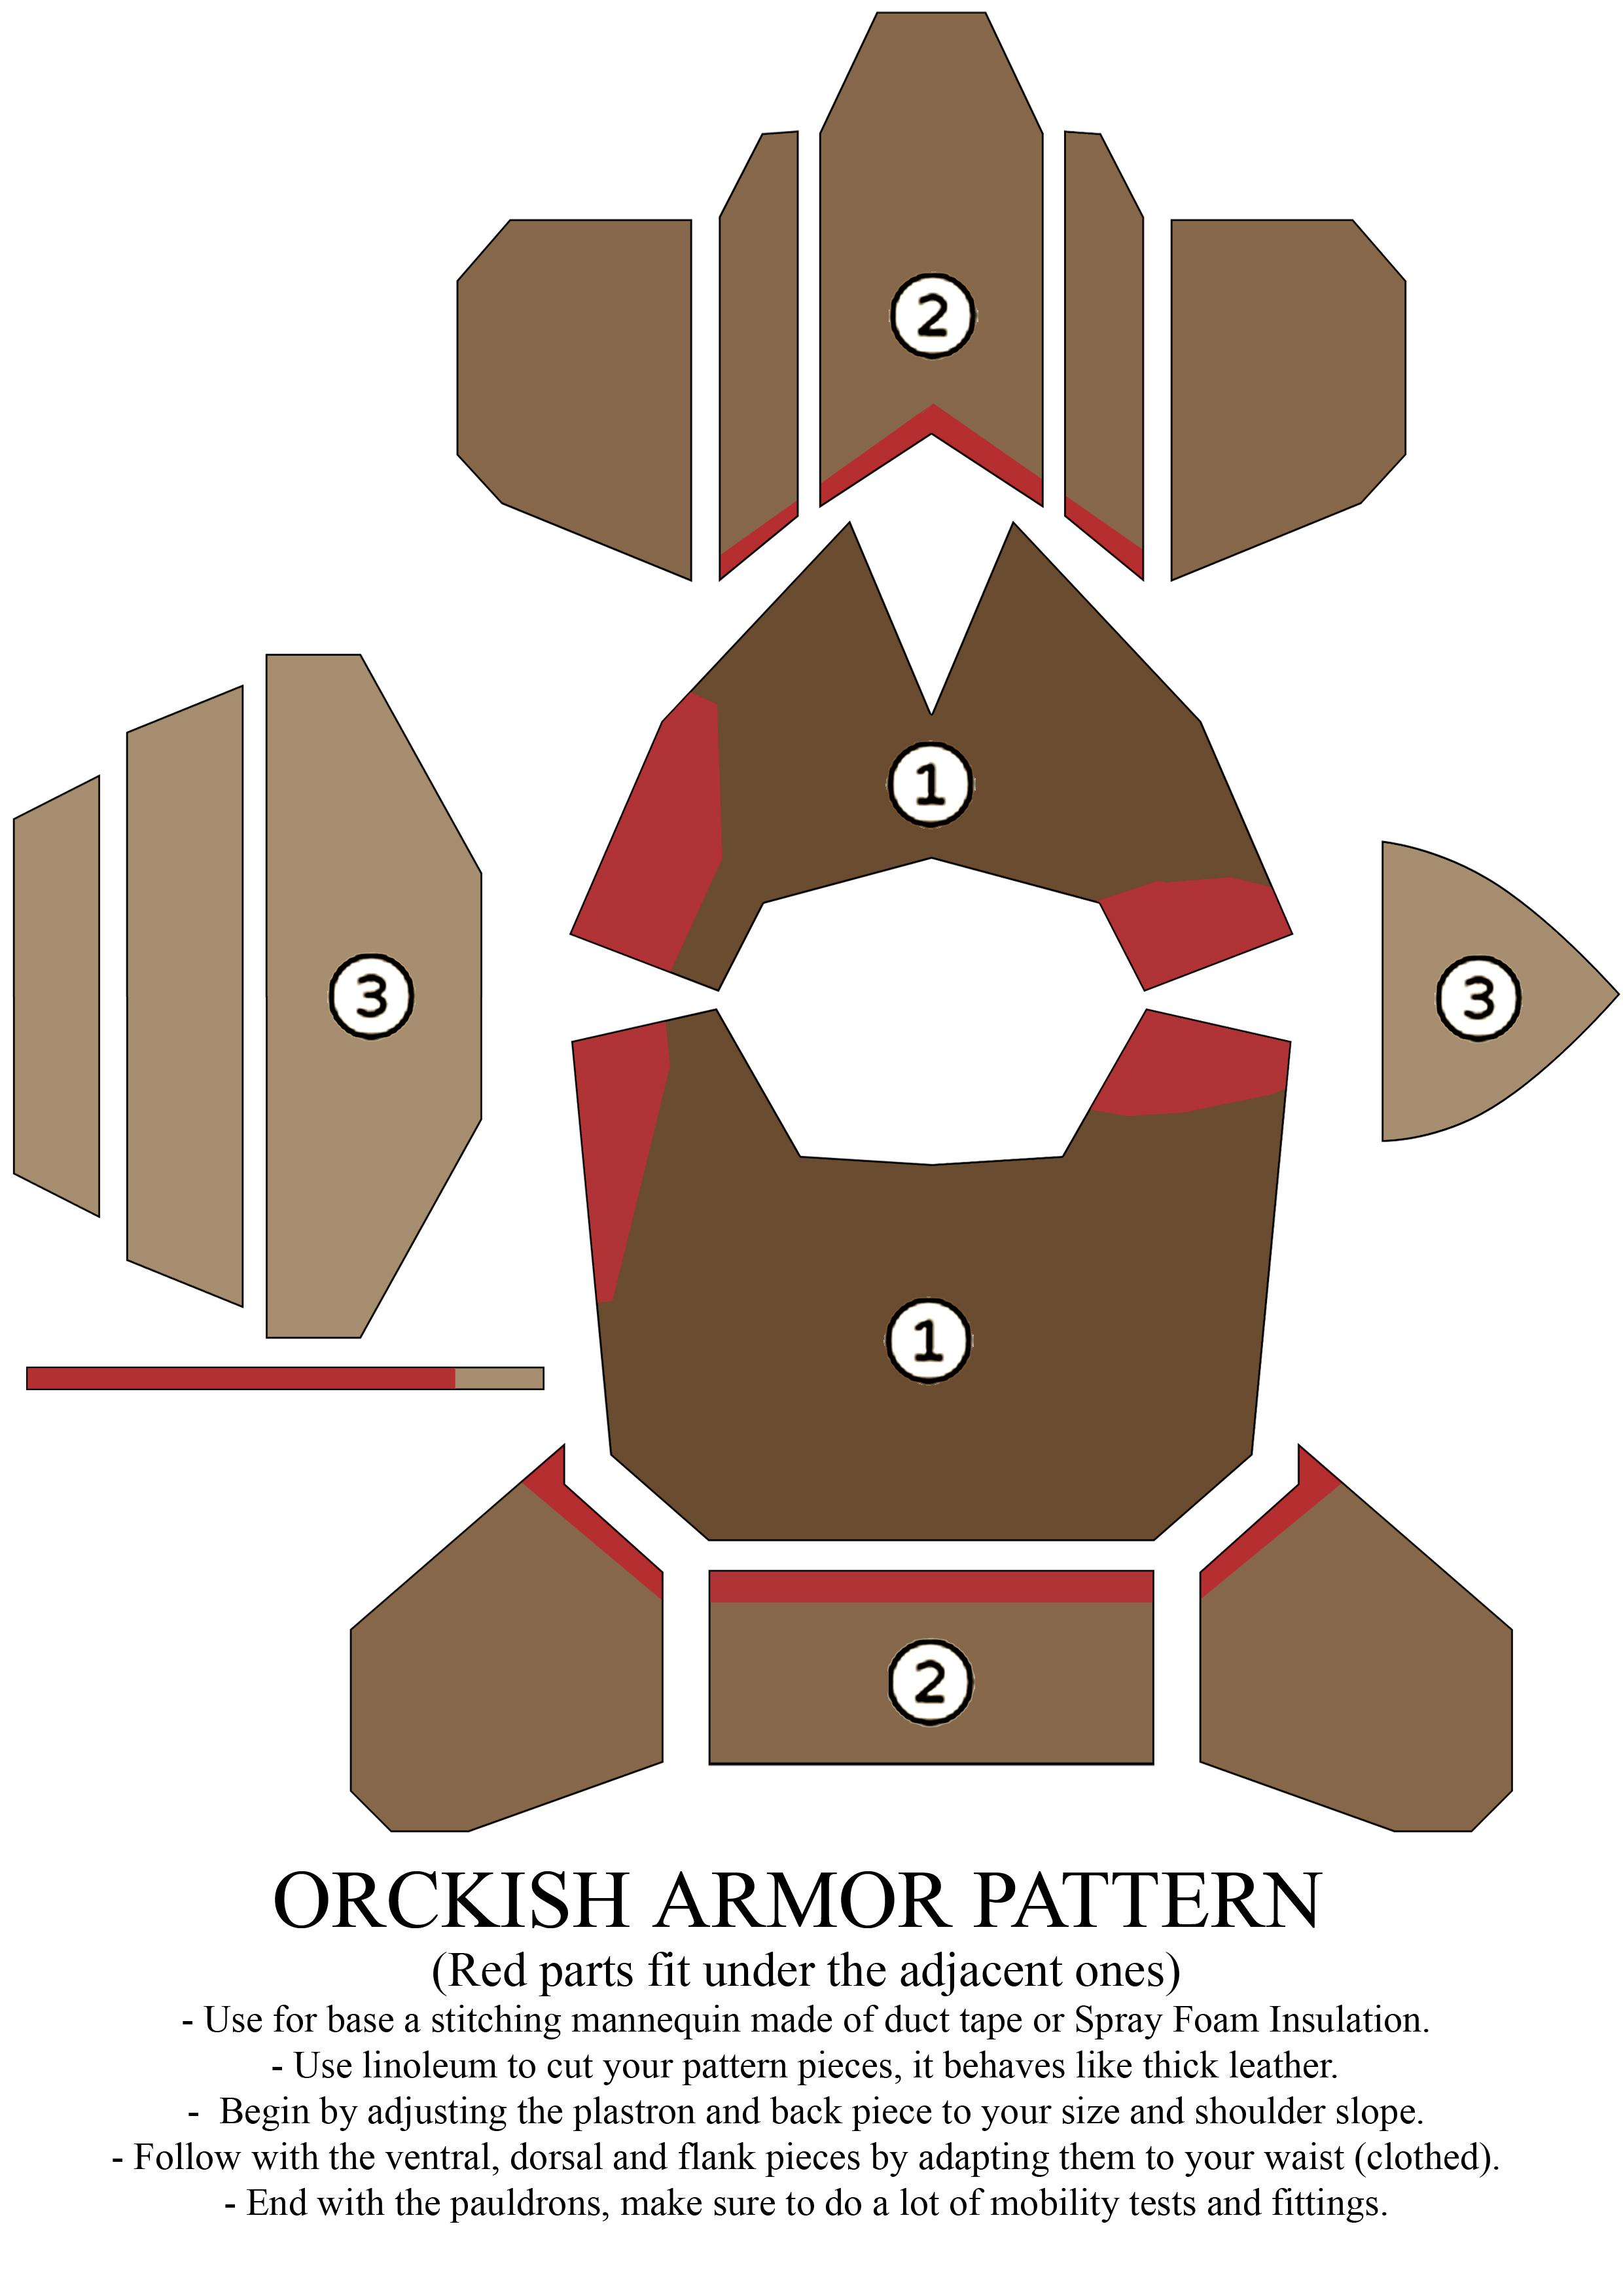 cardboard armour template - orckish armor pattern by zapan99 on deviantart